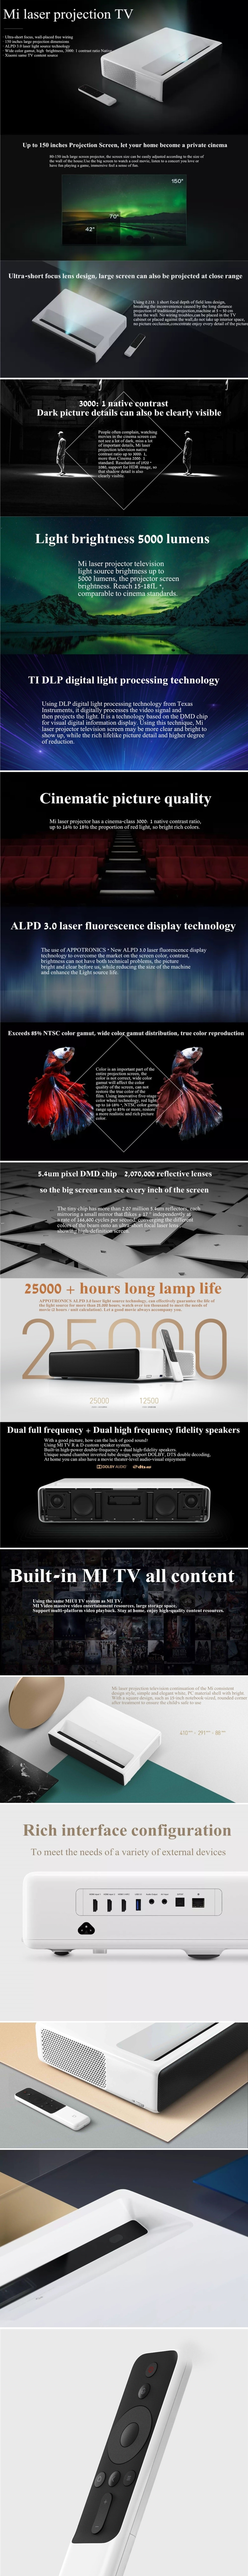 Prezentare-Xiaomi-Mi-Laser-projector-4Kb1e63a004b0cc474.jpg